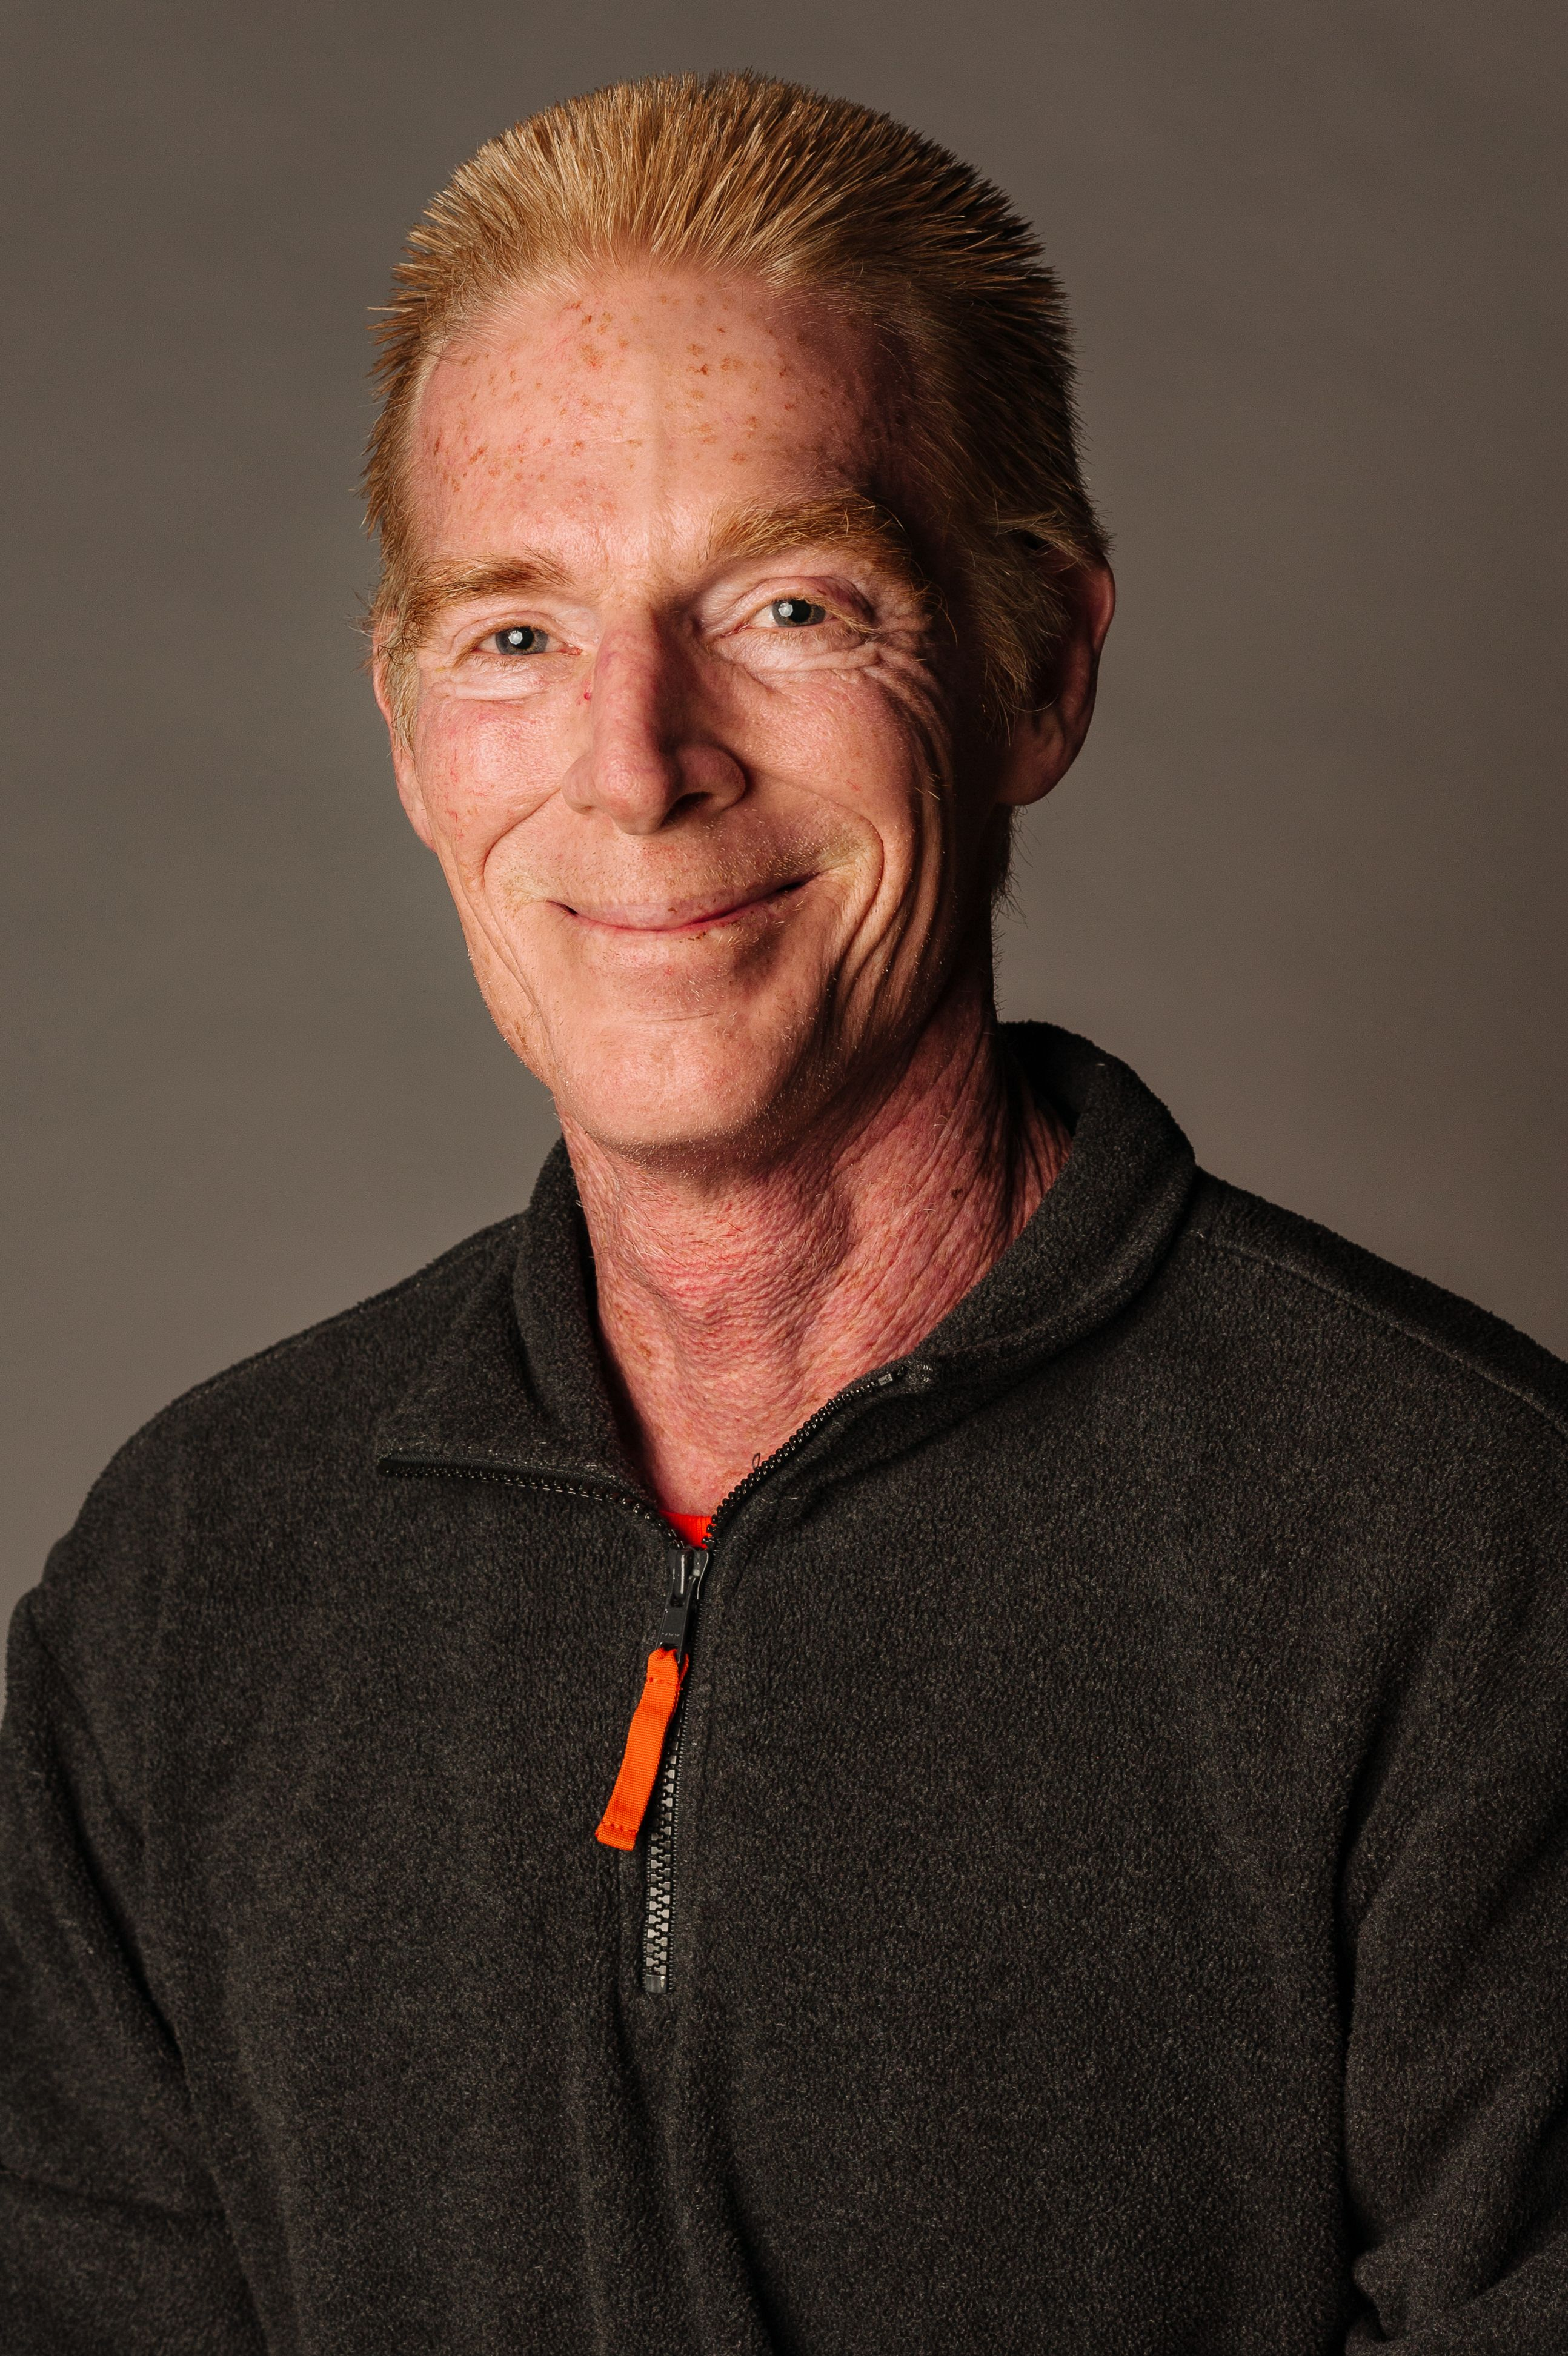 Larry Larsen - Driver